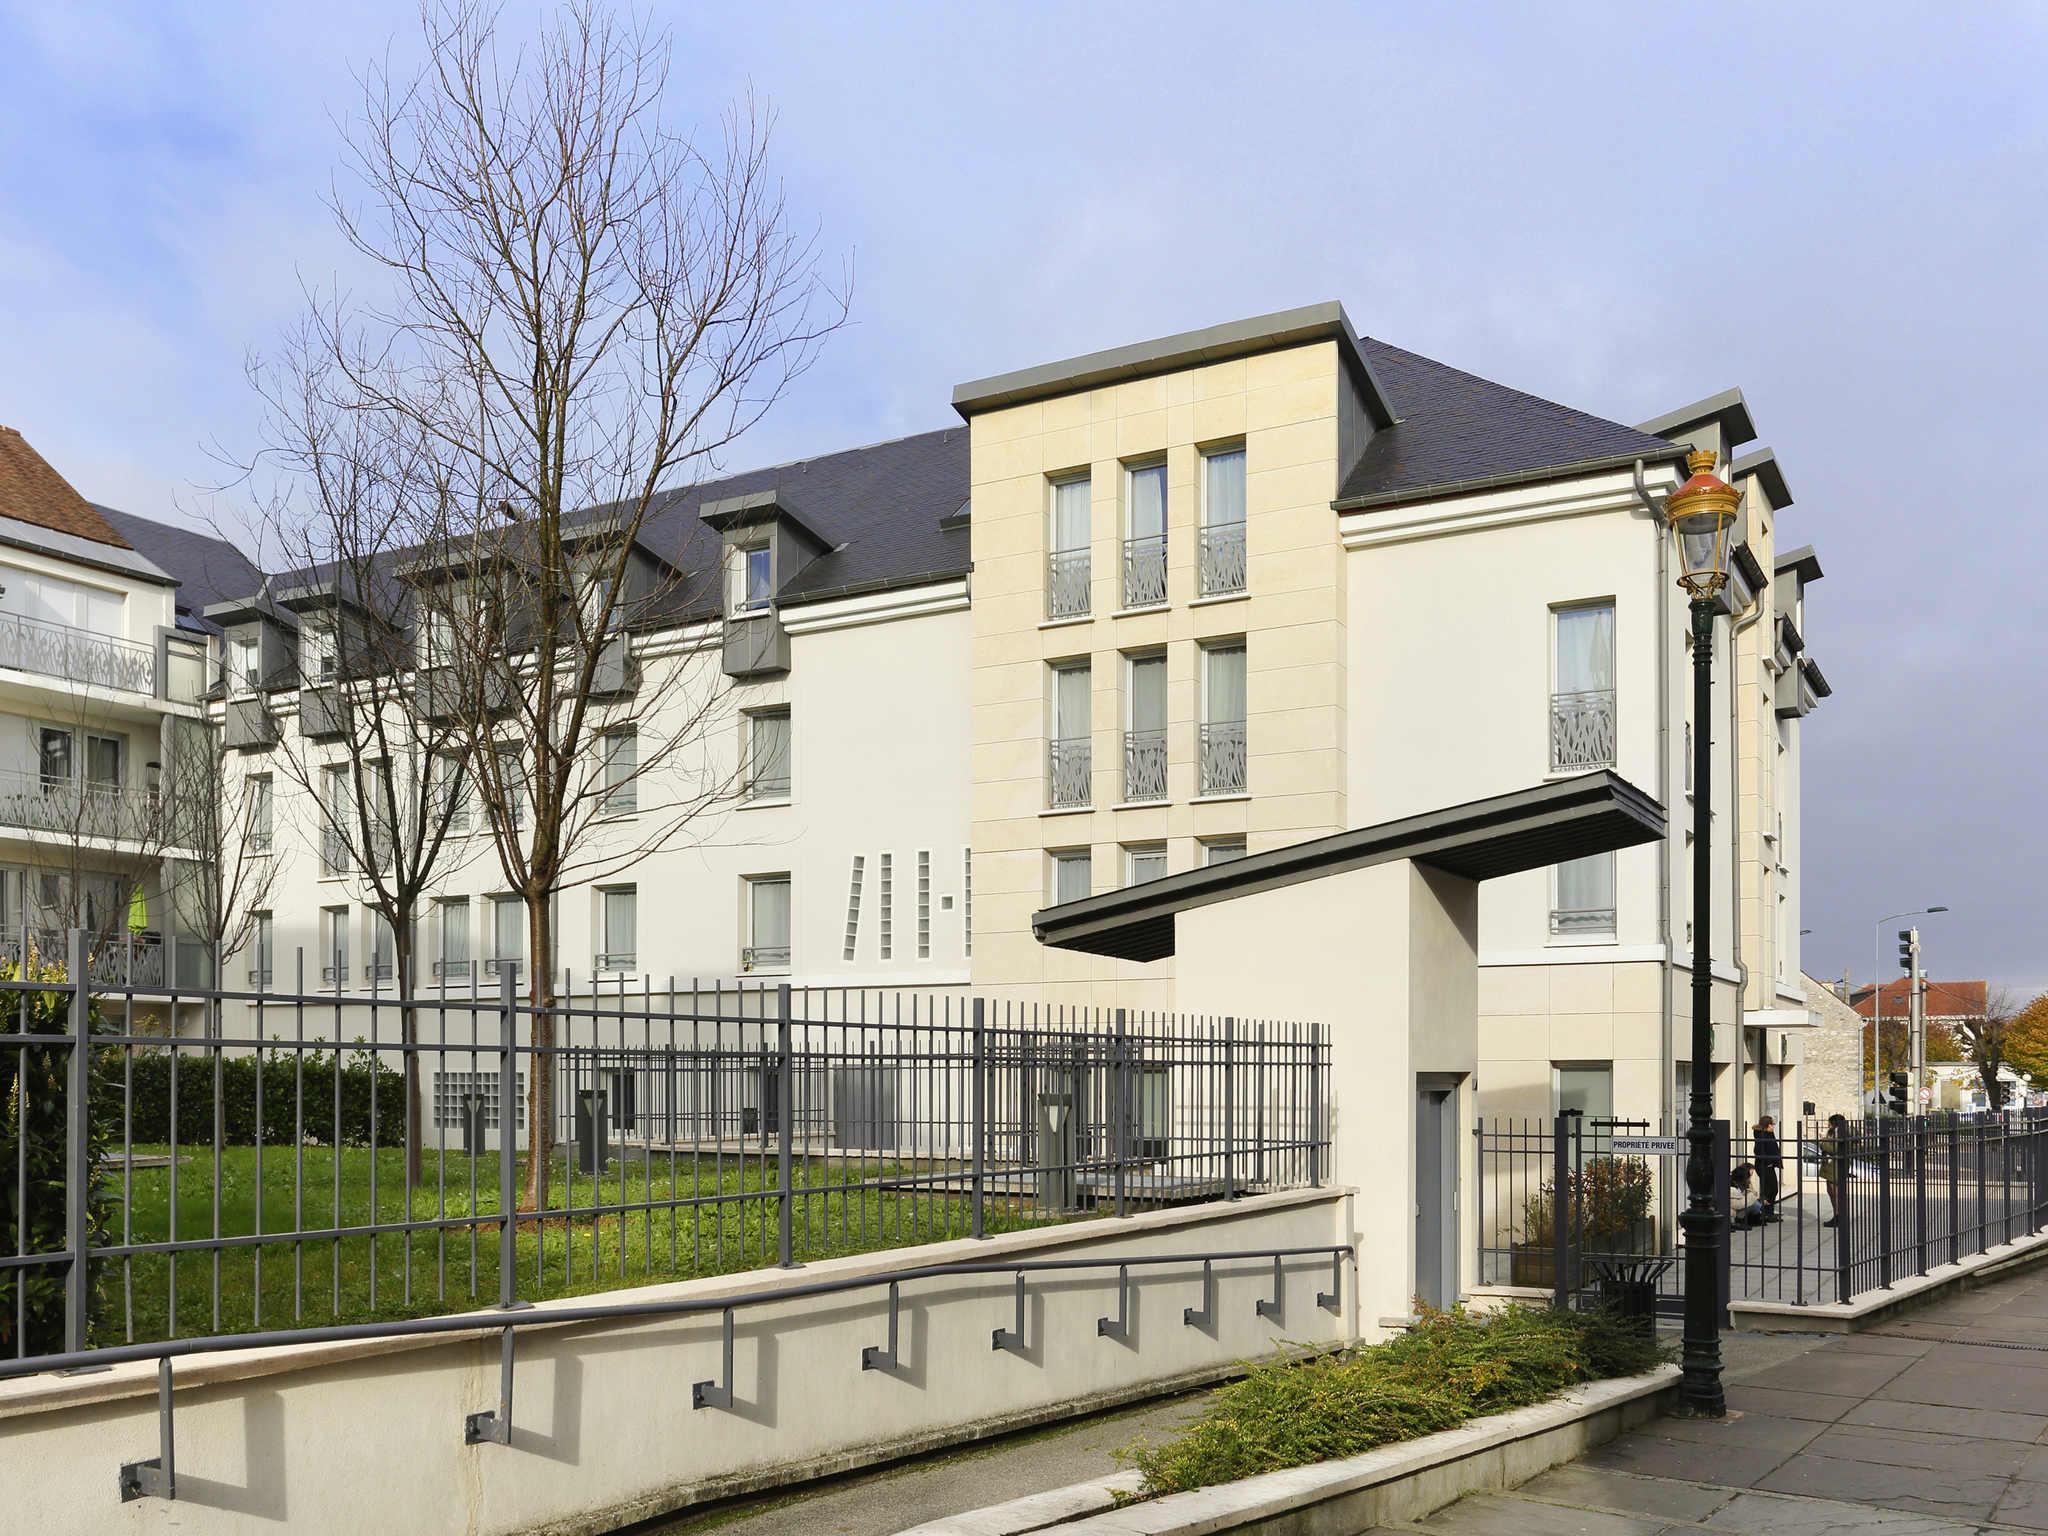 Hotel Mercure Paris Sud Parc Du Coudray Hotel In Etampes Ibis Etampes